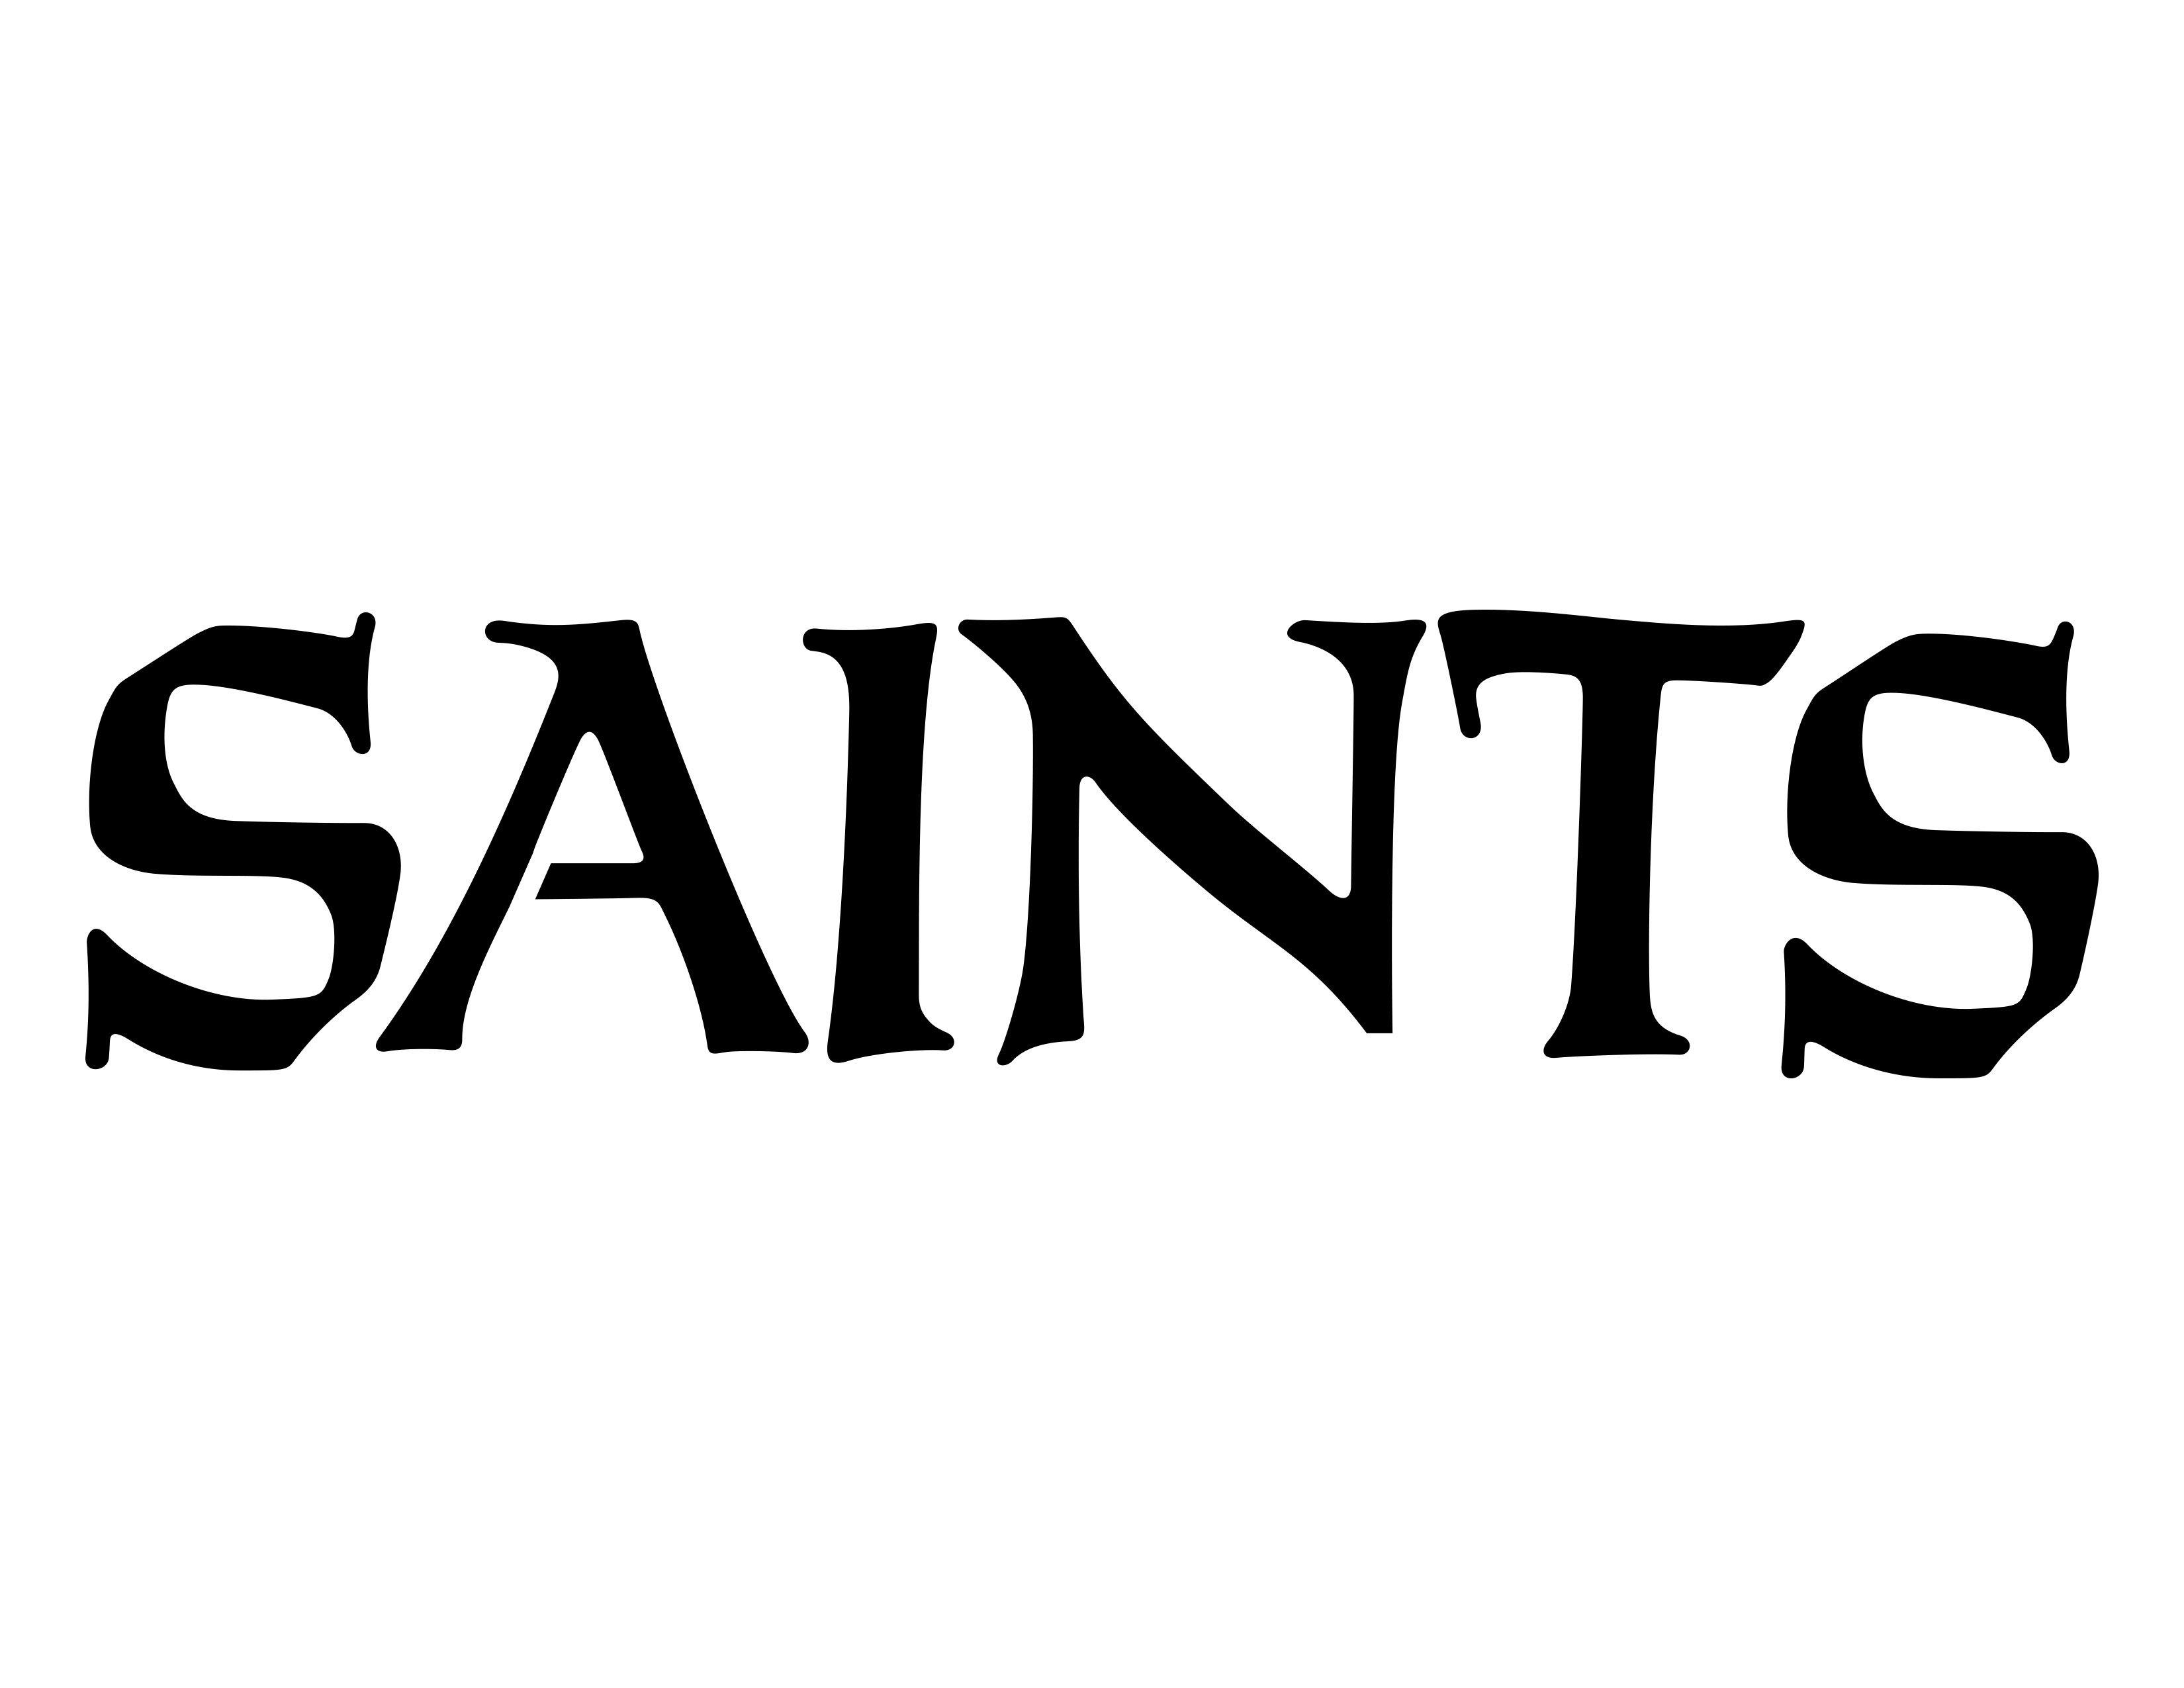 New orleans saints silhouette pinterest saints stenciling new orleans saints alternate logo national football league nfl chris creamers sports logos page sportslogos biocorpaavc